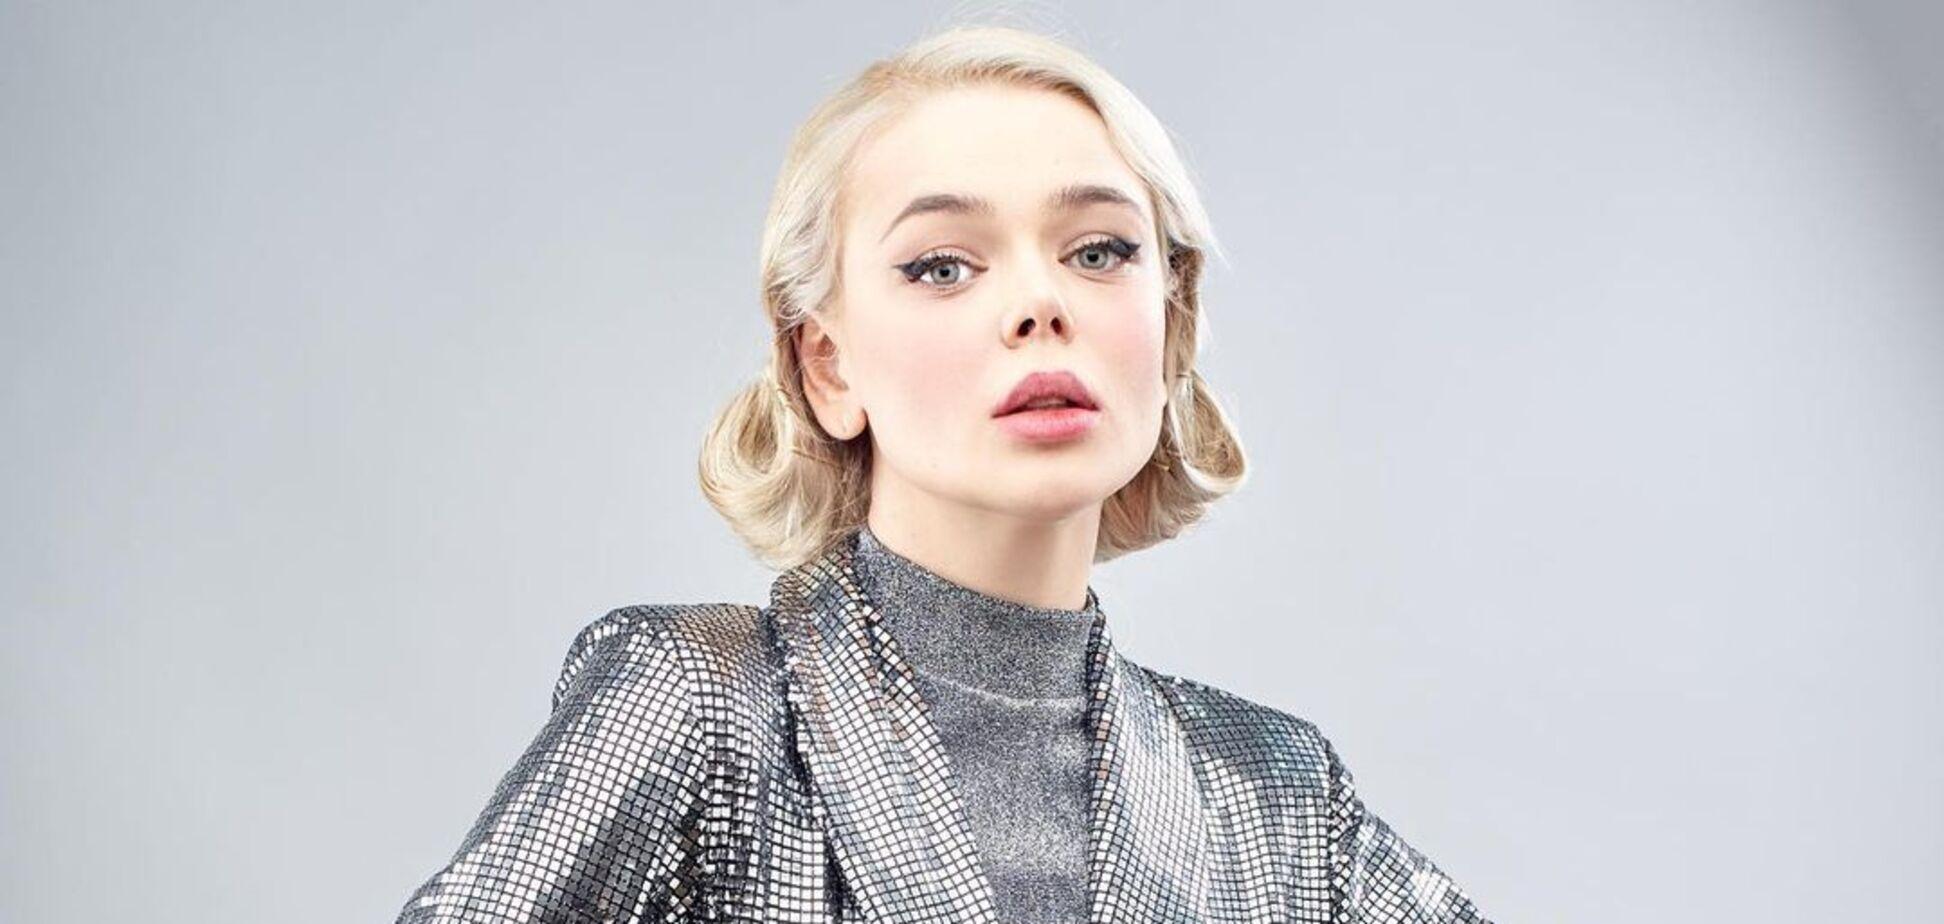 Українська співачка Аліна Гросу